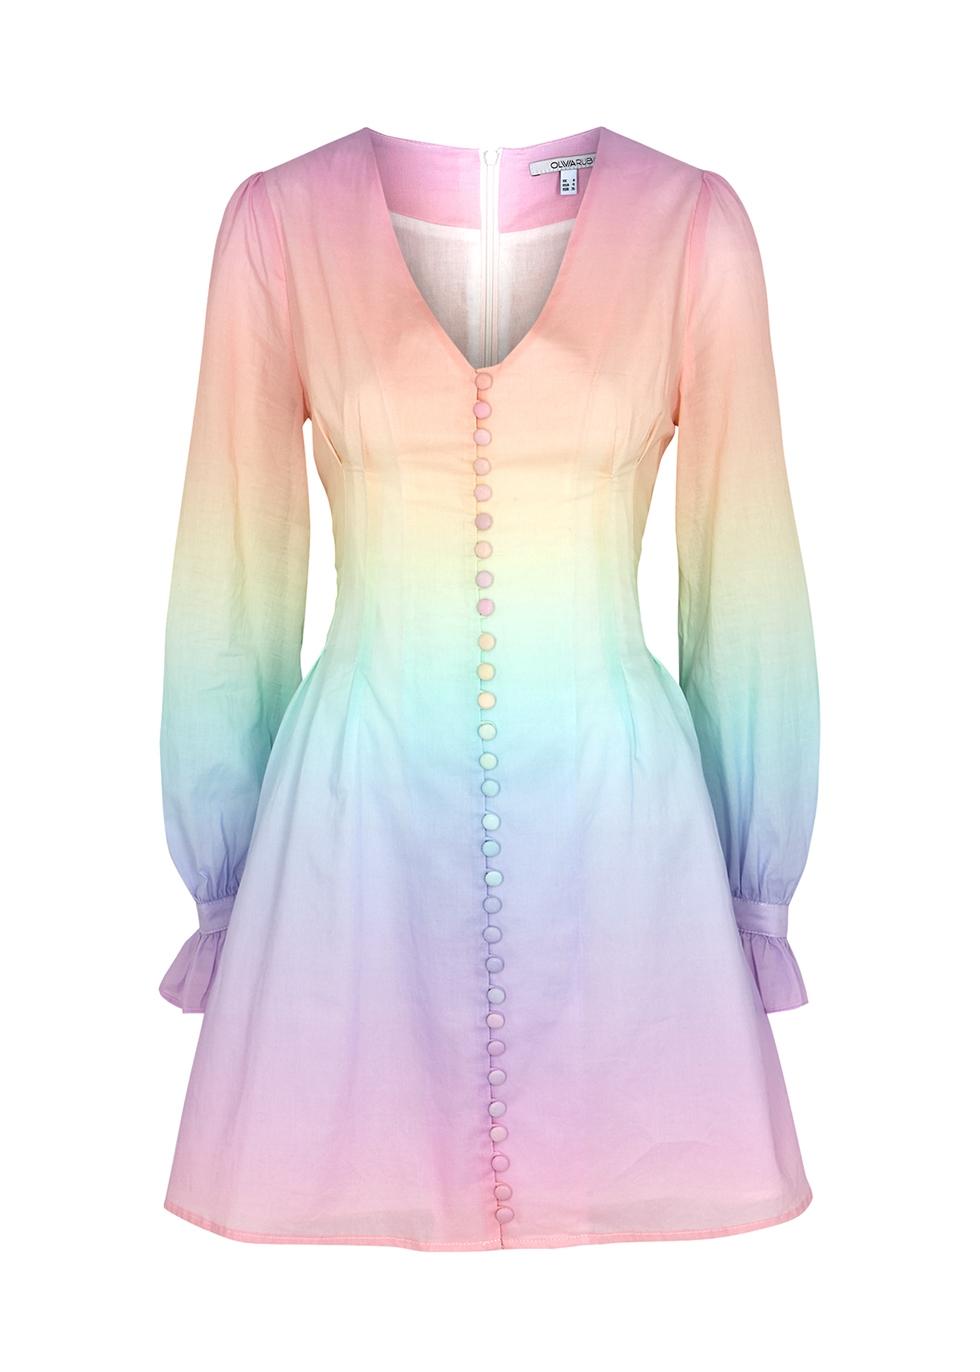 7c454247d Harvey Nichols - Designer Fashion, Beauty, Food & Wine